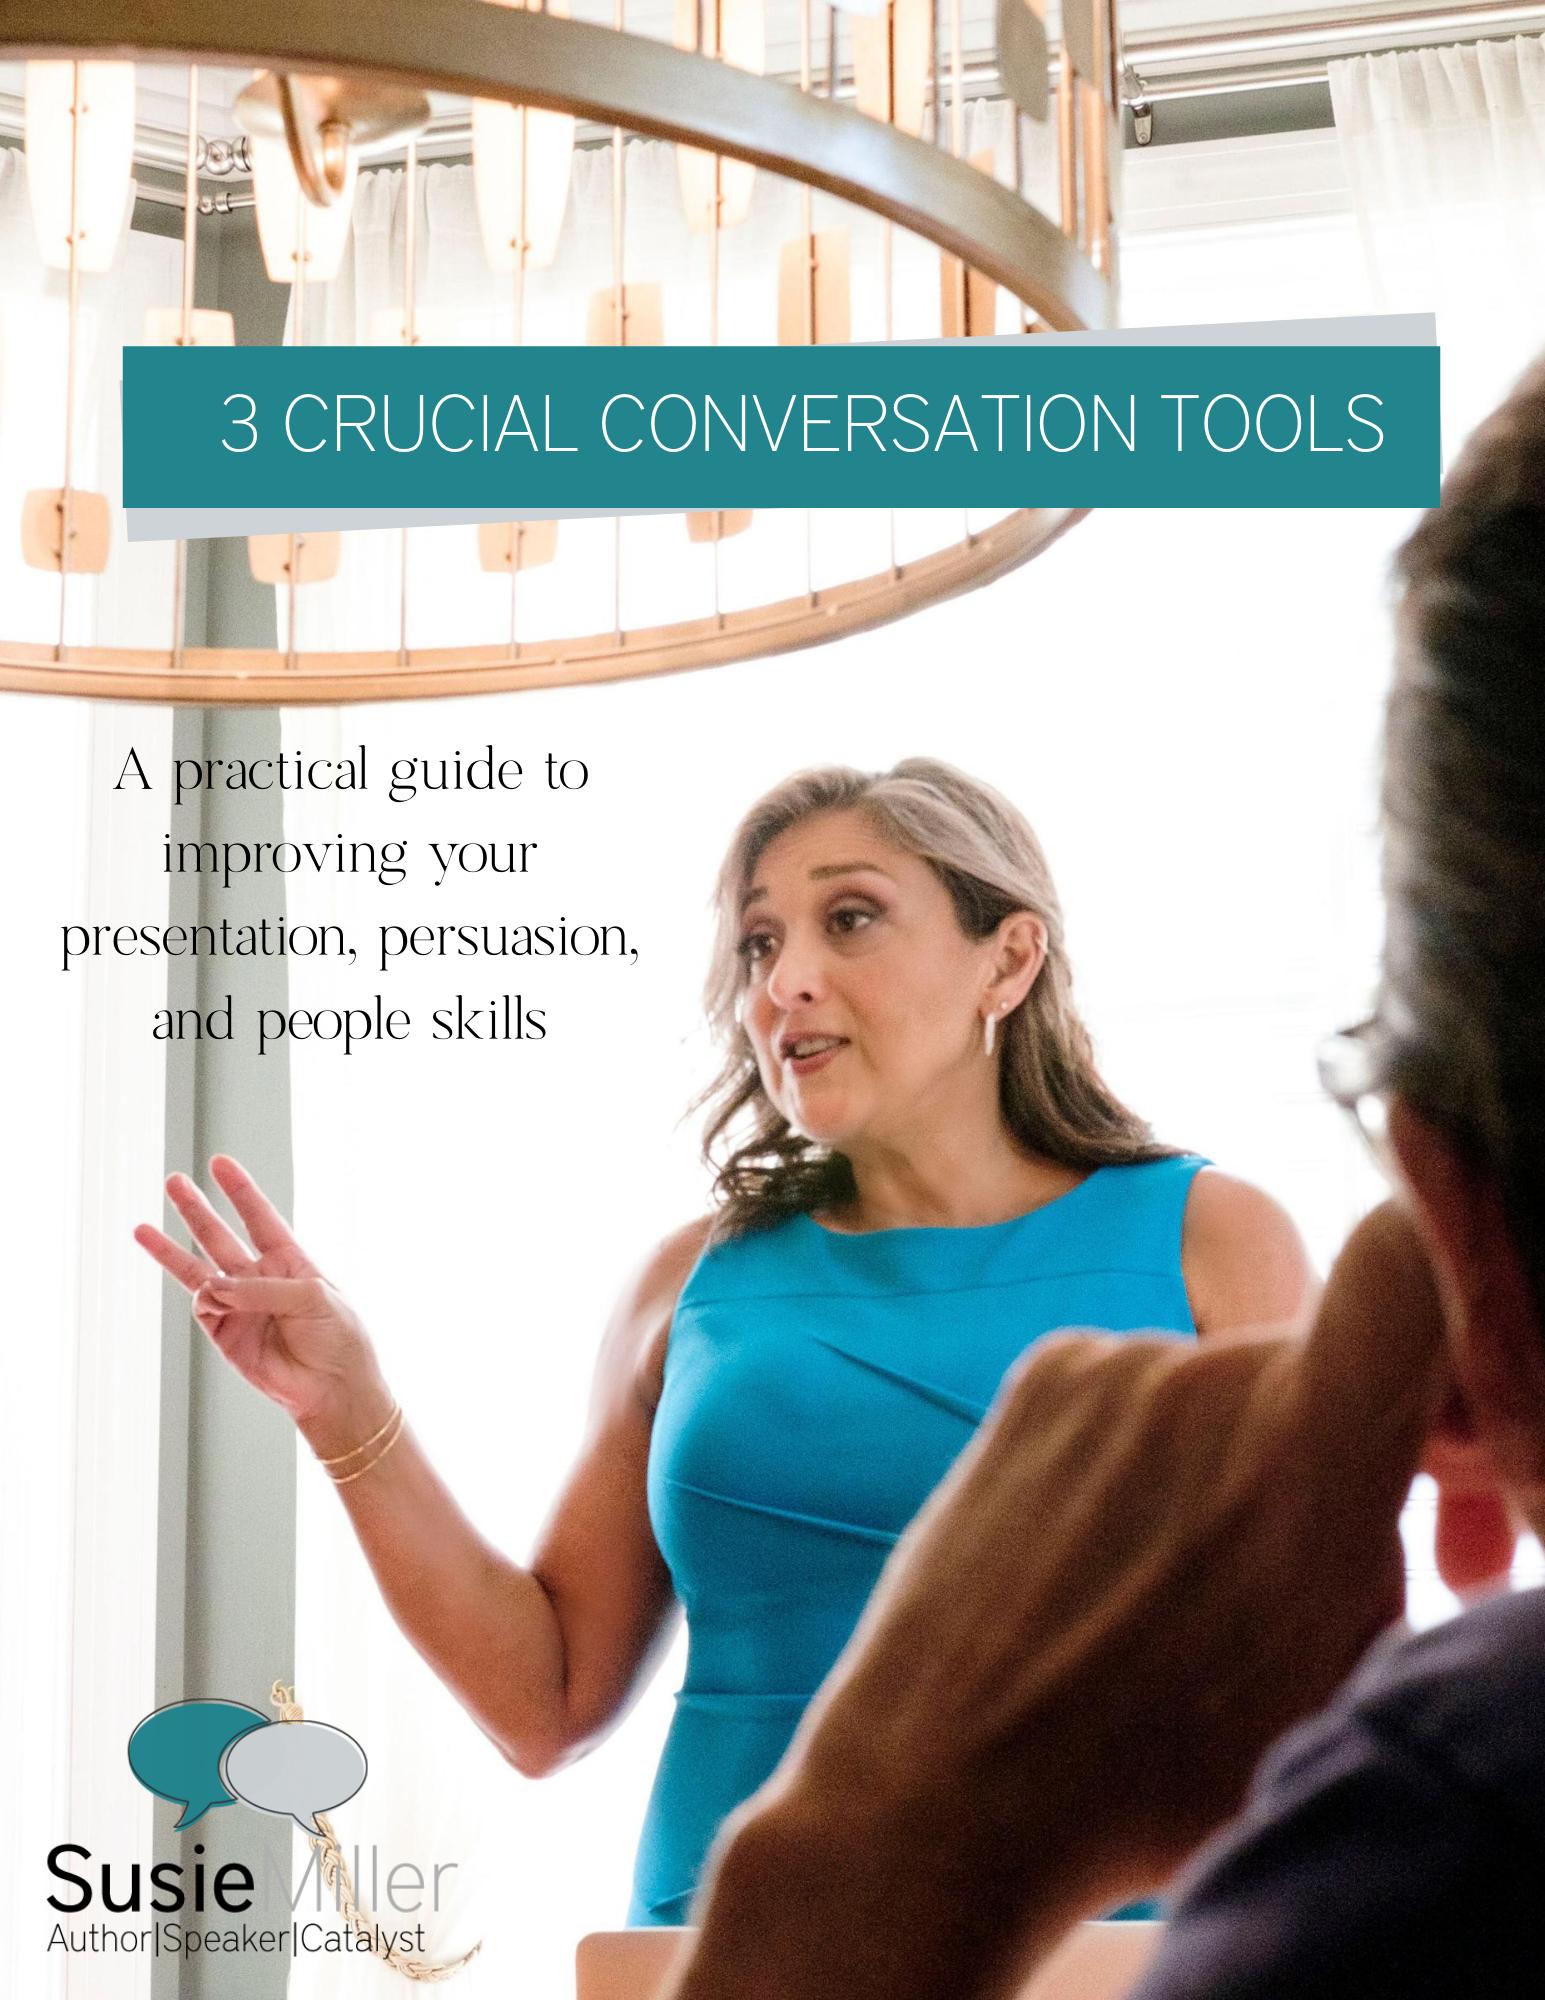 3 Crucial Conversation Tools